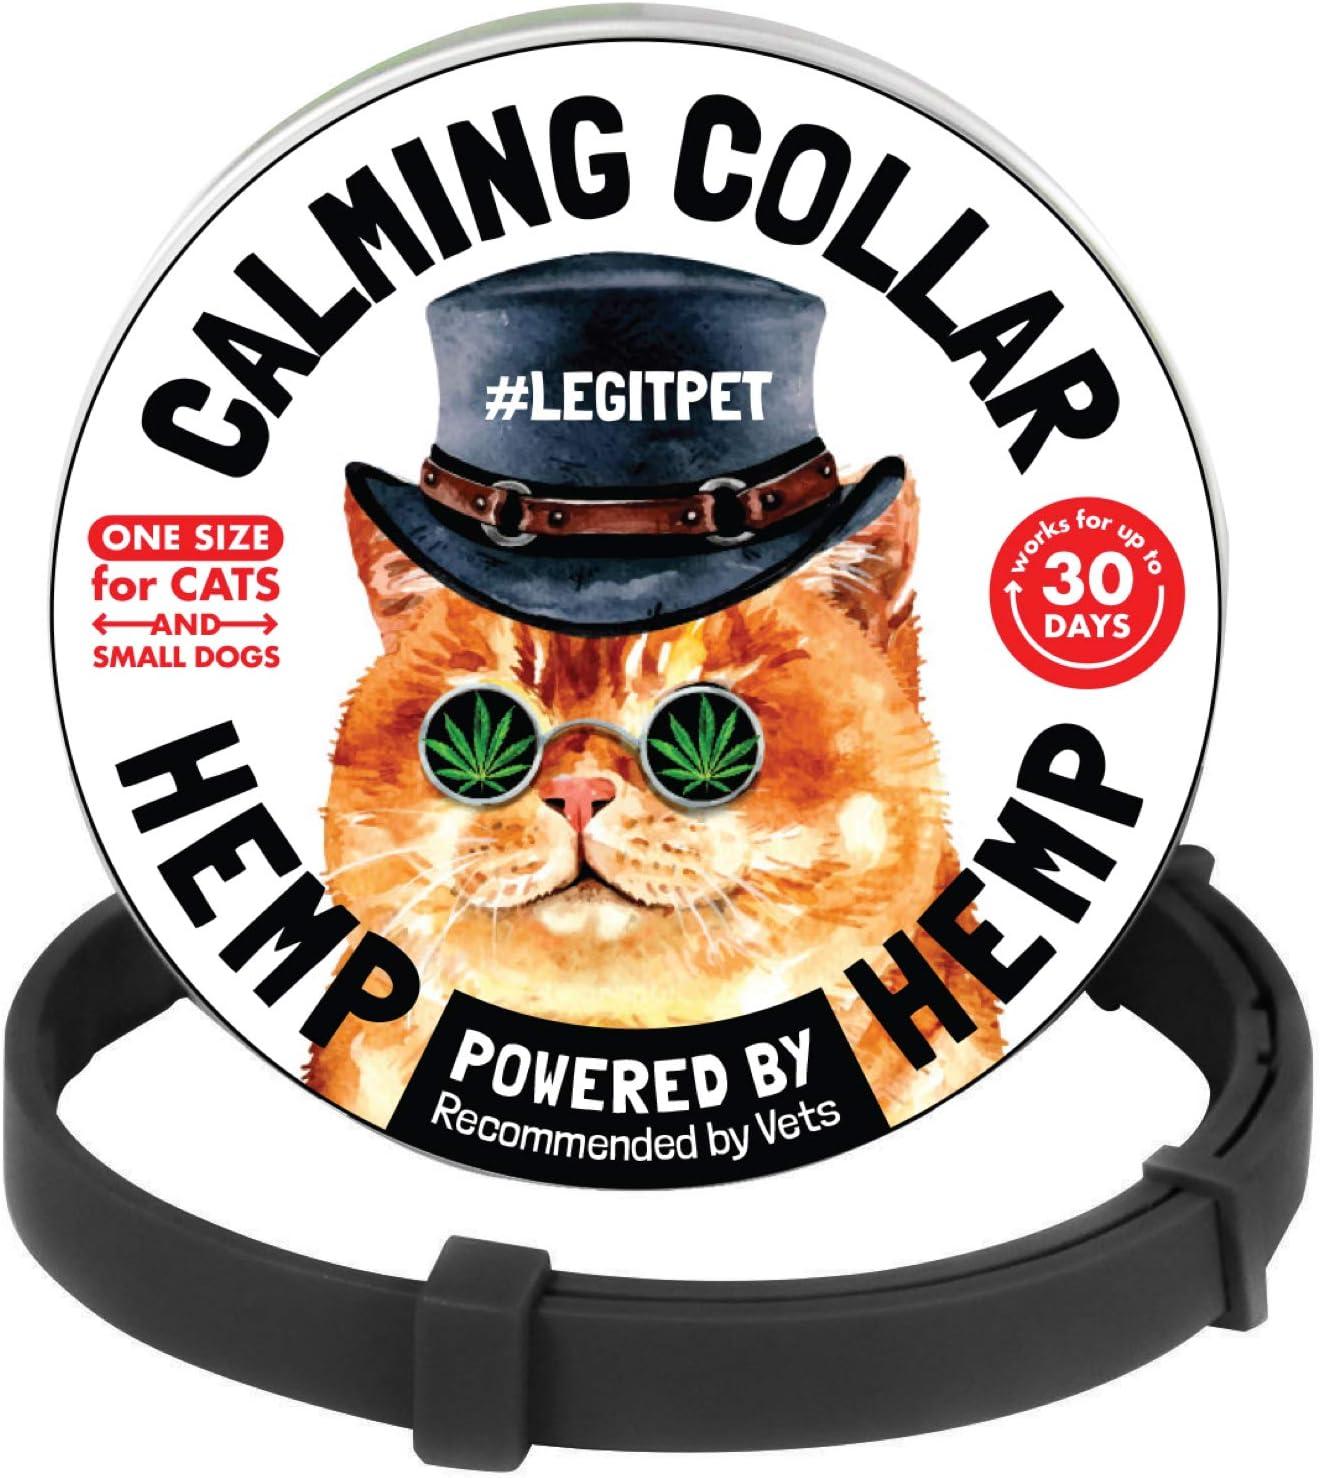 LEGITPET High Super popular specialty store quality new Cat Calming Collar with Reduce Hemp Stress N -